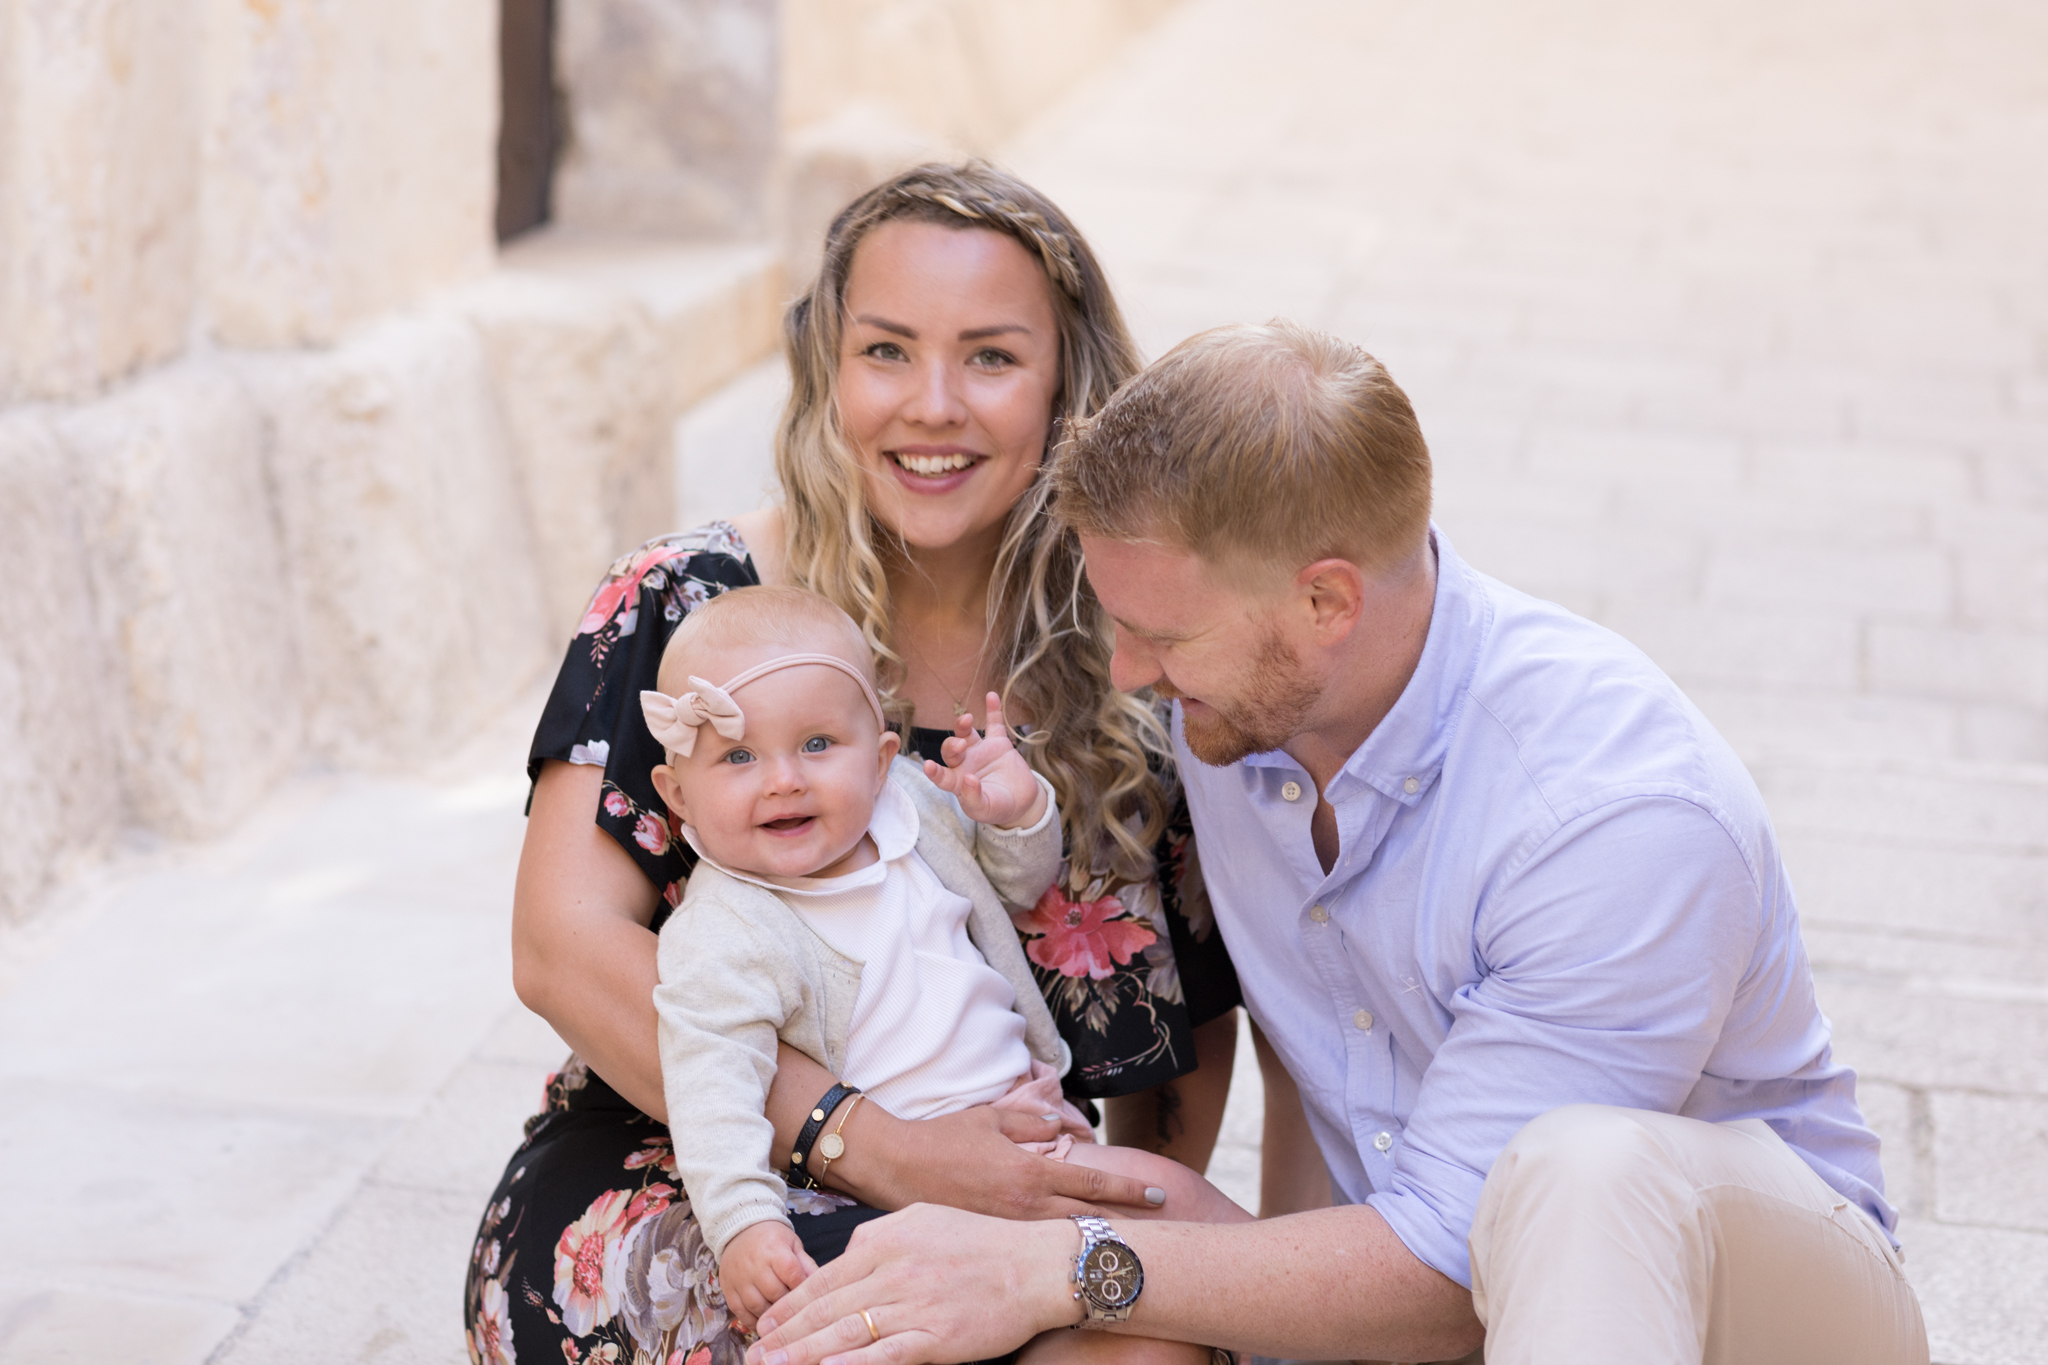 sunrise in mdina, historic location for a photo shoot, family photography malta,Family photo shoot Malta, whimsical, organic